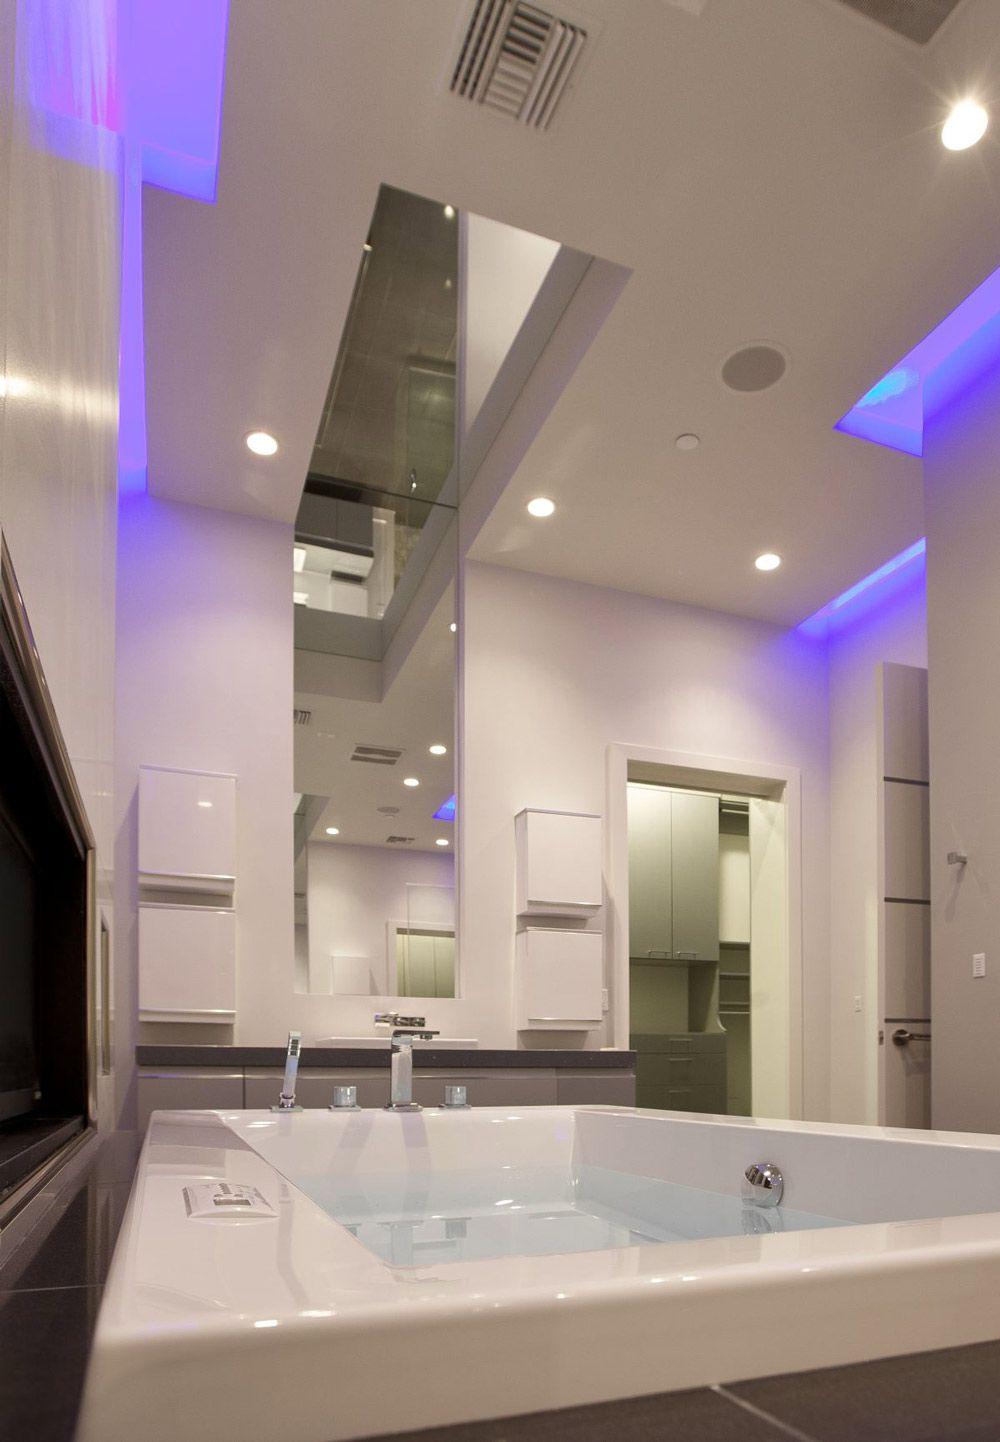 Bathroom, Large Mirror, Blue LED Lighting, Hurtado Residence in Las ...